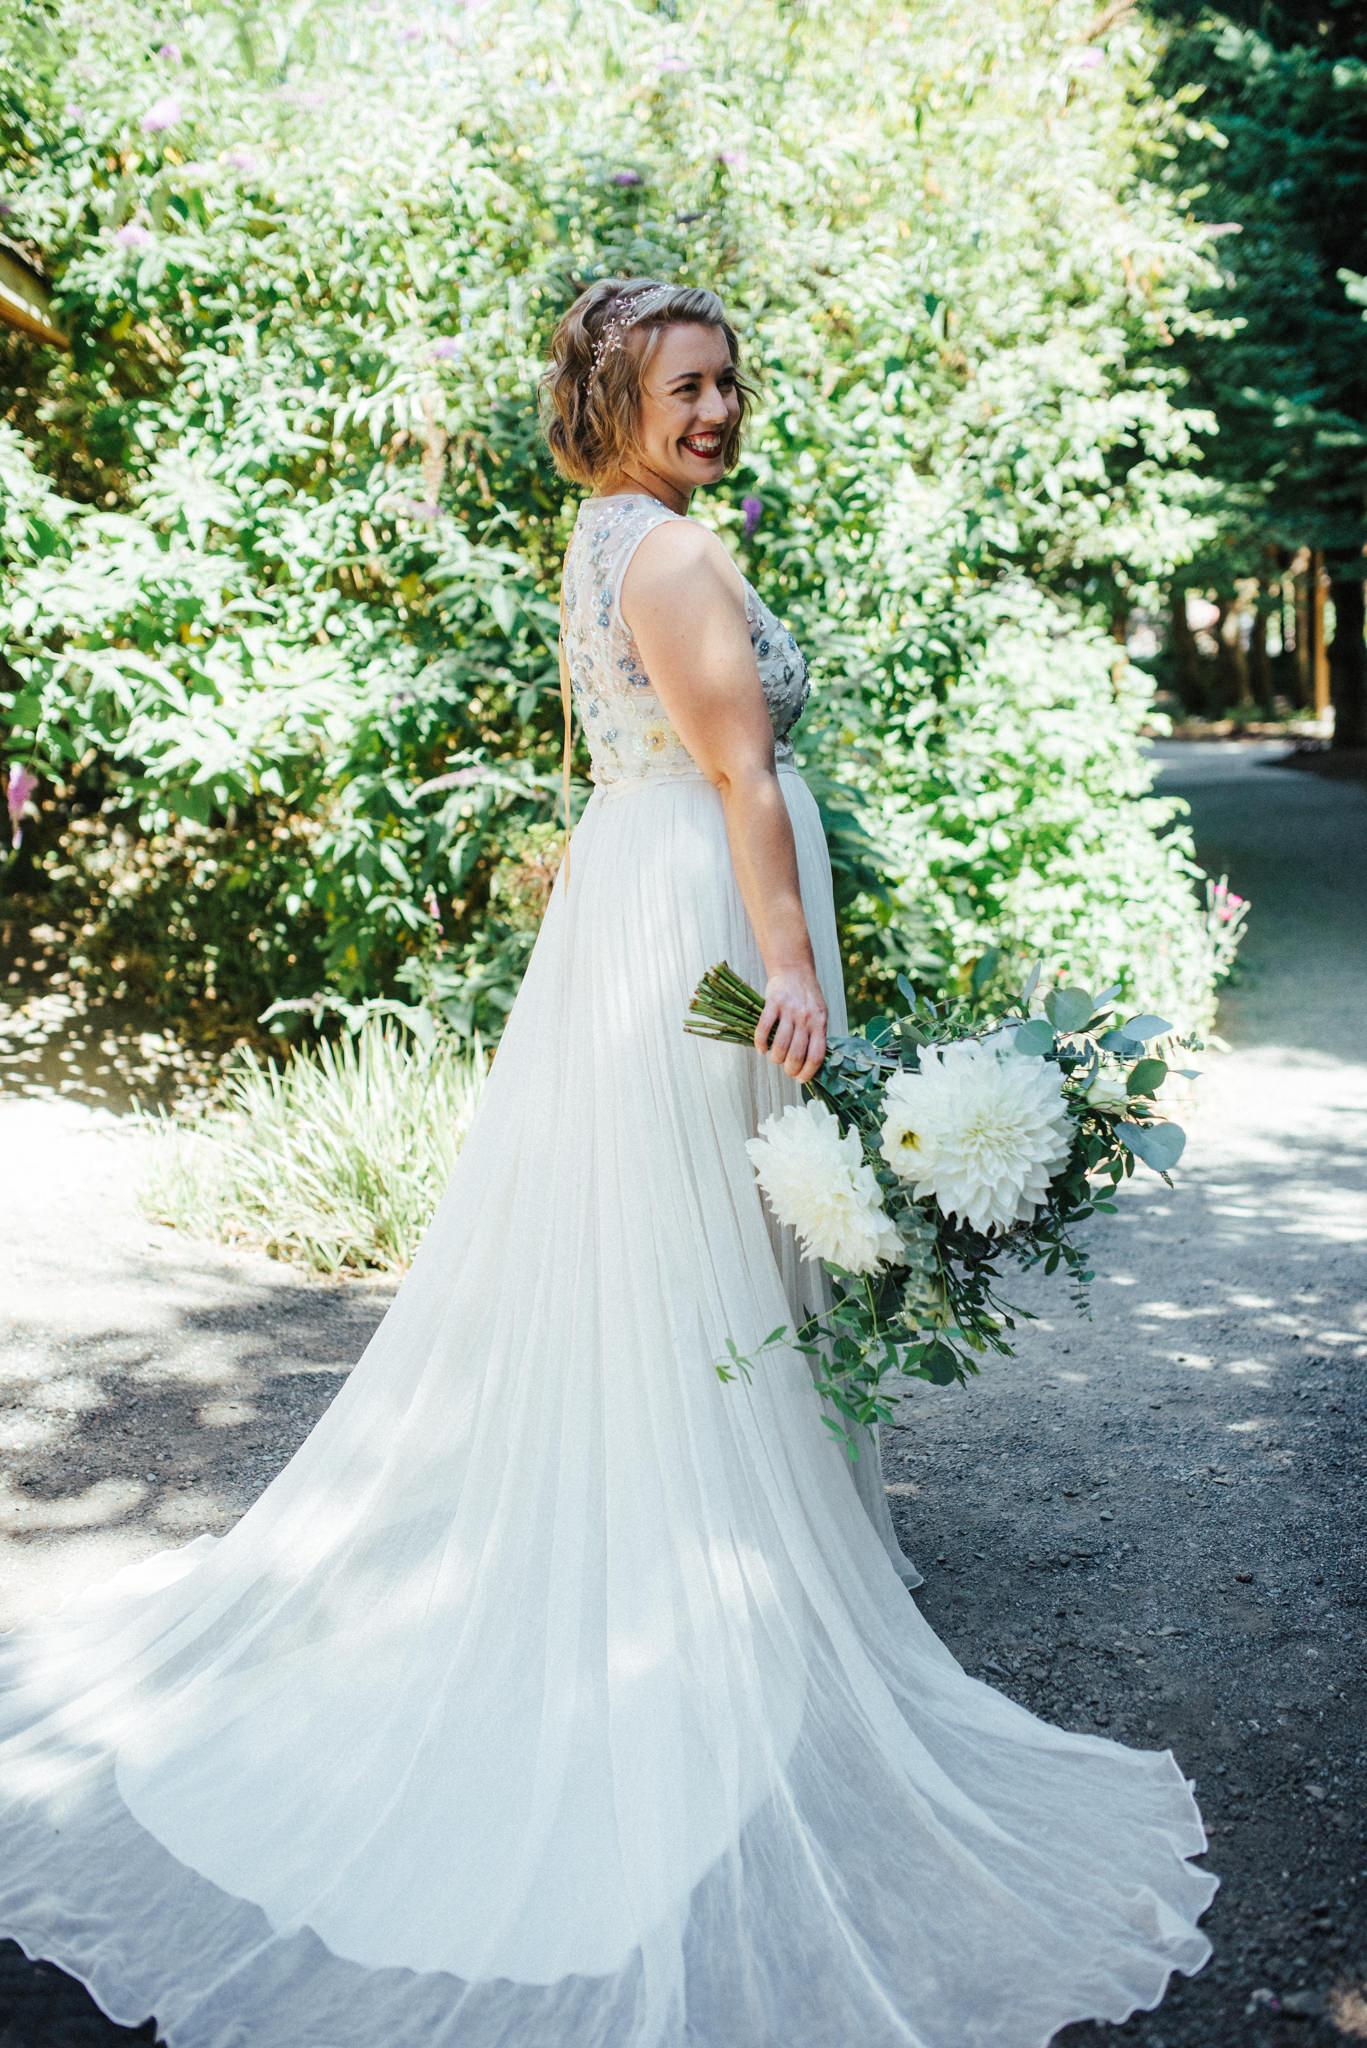 Amy Steven Seattle Wedding Photographer Vishal Goklani_011.jpg